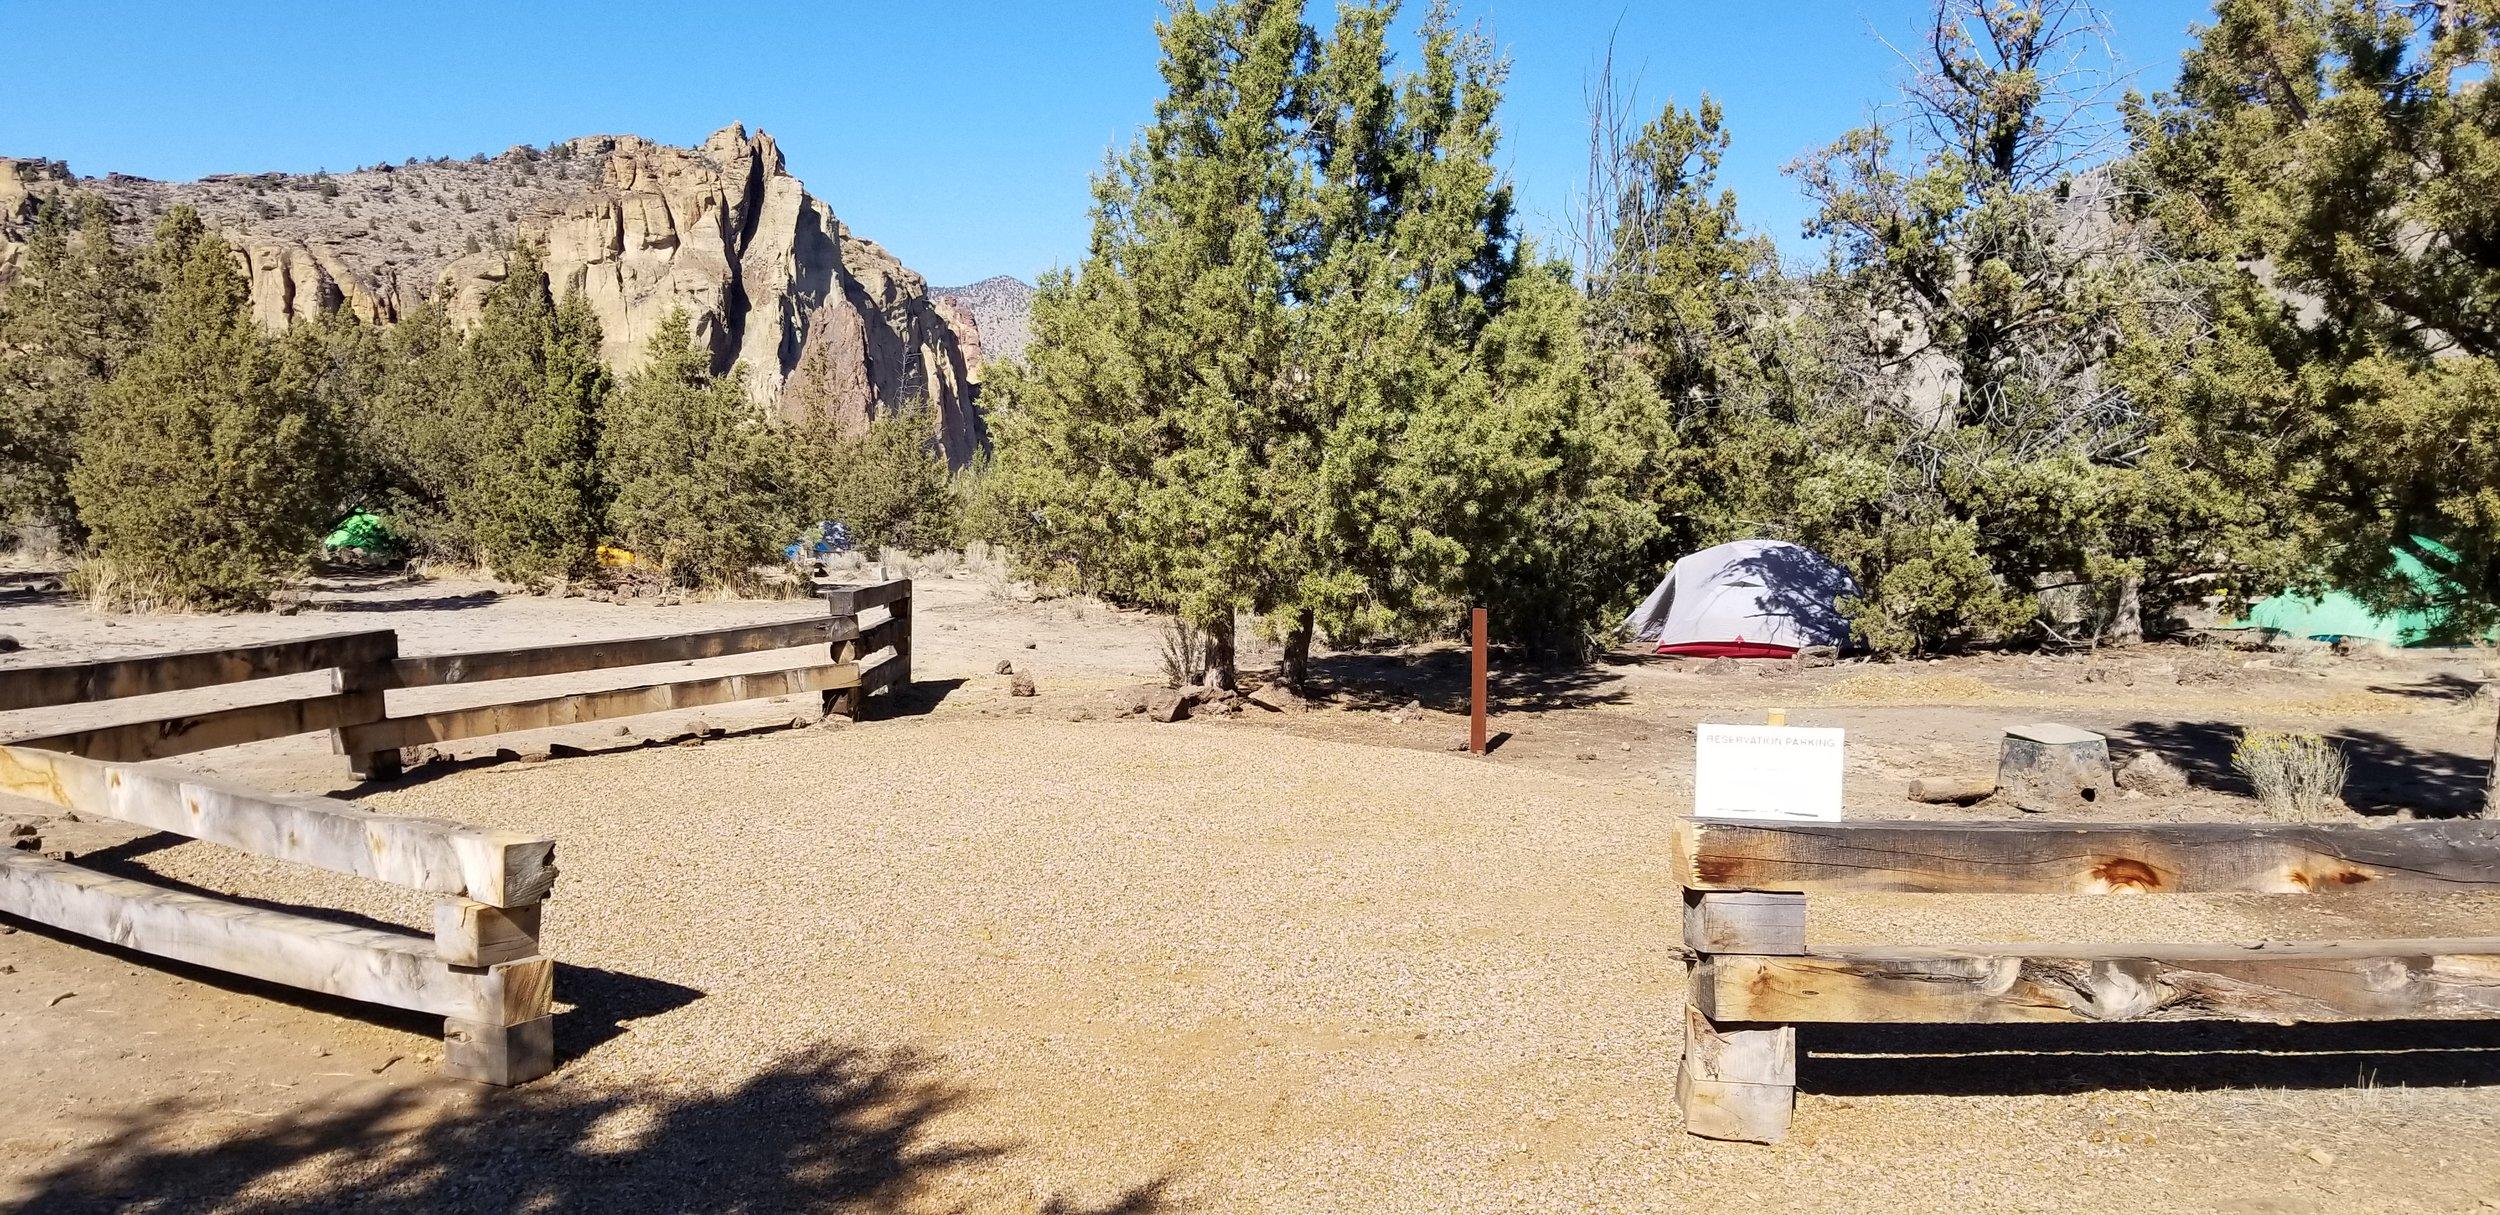 ADA campsite in the Smith Rock State Park Bivouac area